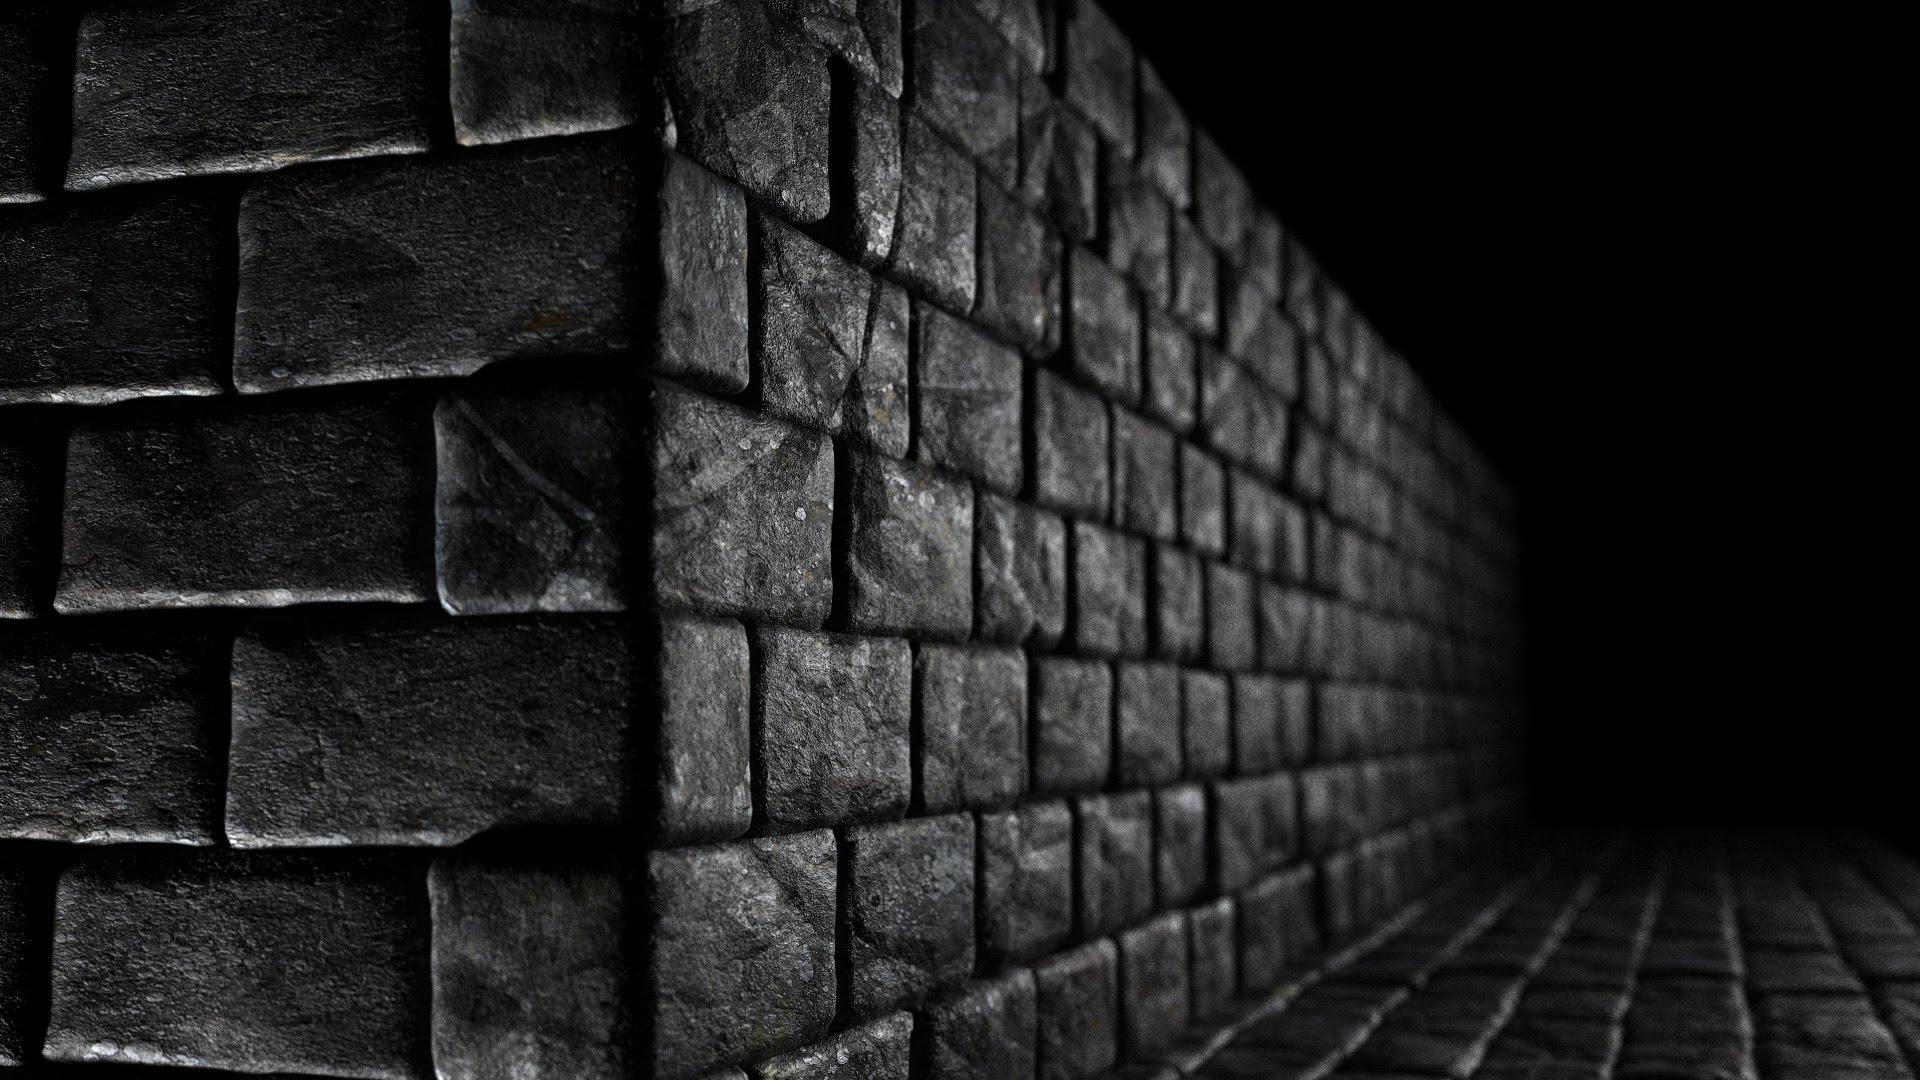 Blender Tutorial: Stone Brick Wall - YouTube